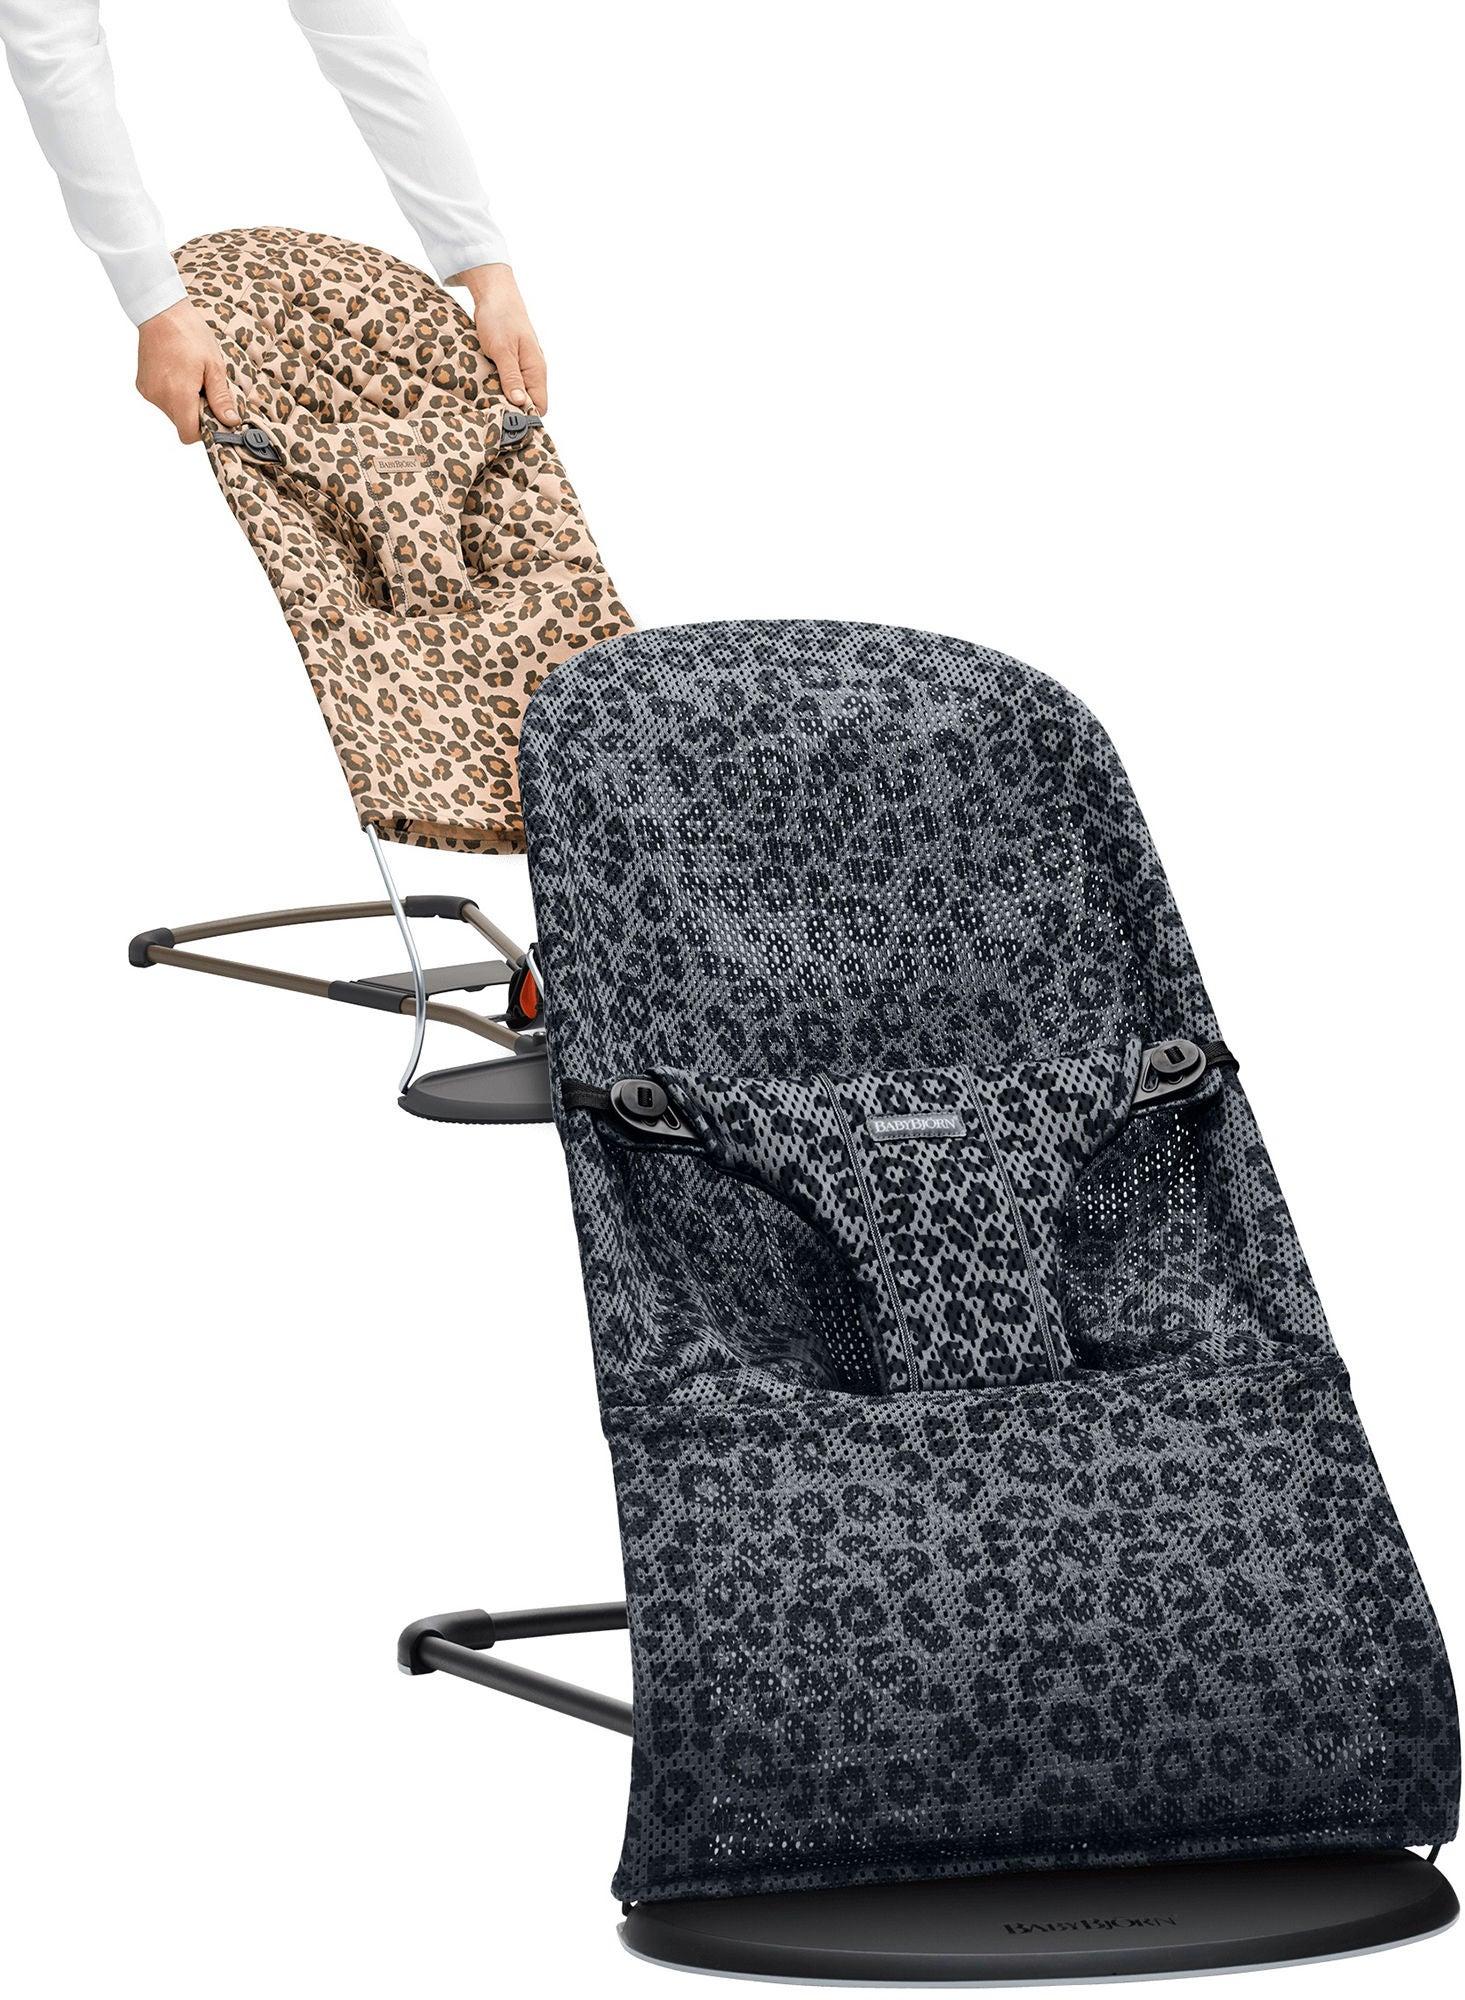 BabyBjörn Bliss Babysitter Mesh Leopard inkl. Cotton Tygsits, Antracit/Beige